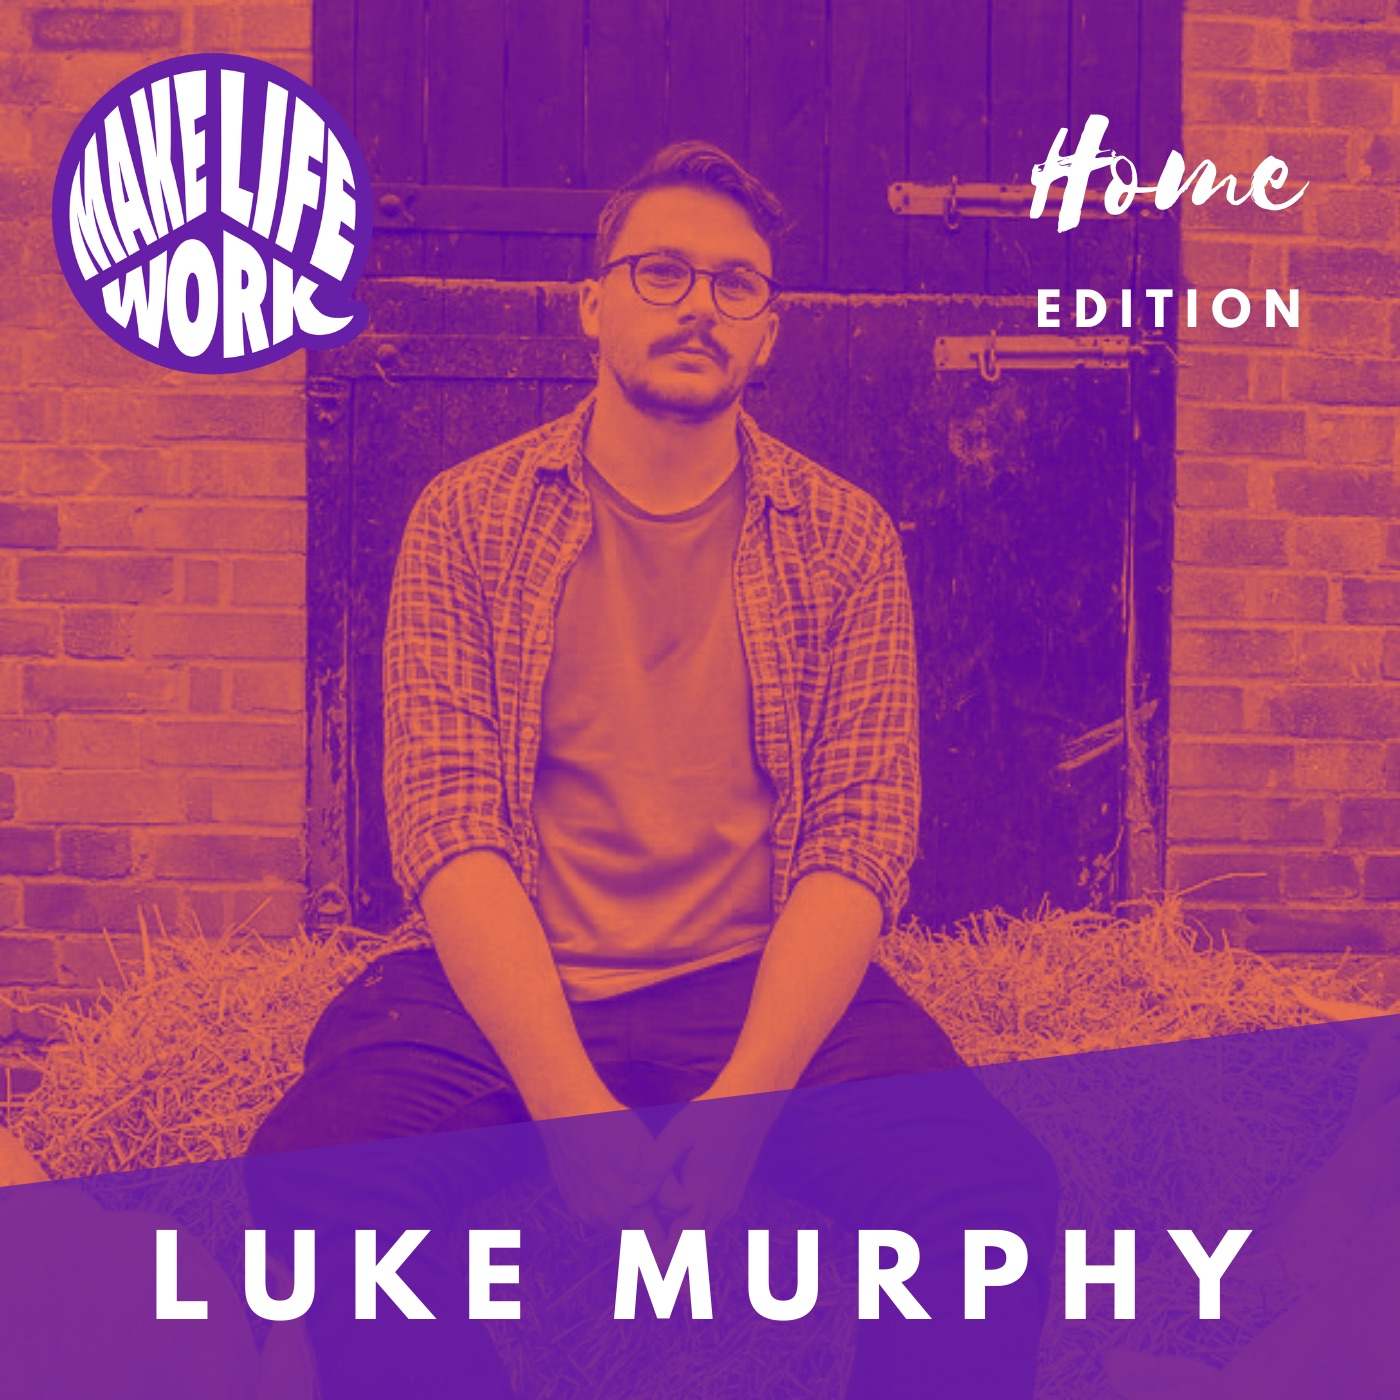 Make Life Work with Luke Murphy